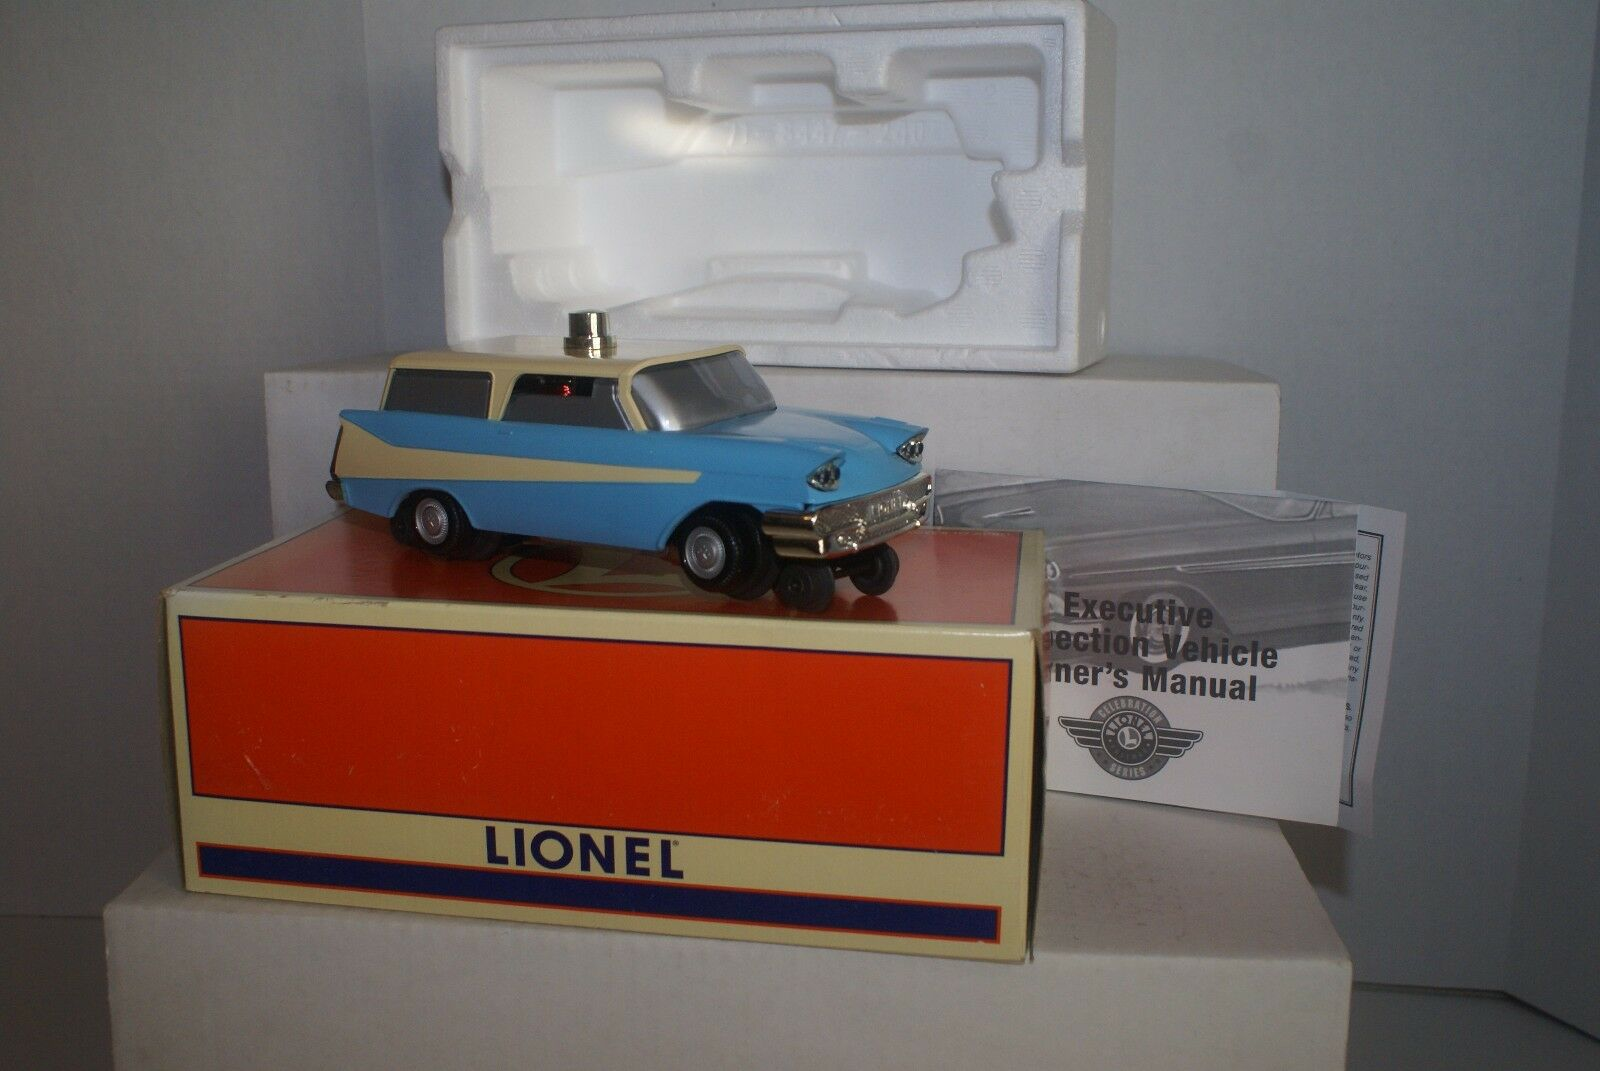 LIONEL 6-18454 blueE EXECUTIVE INSPECTION CAR